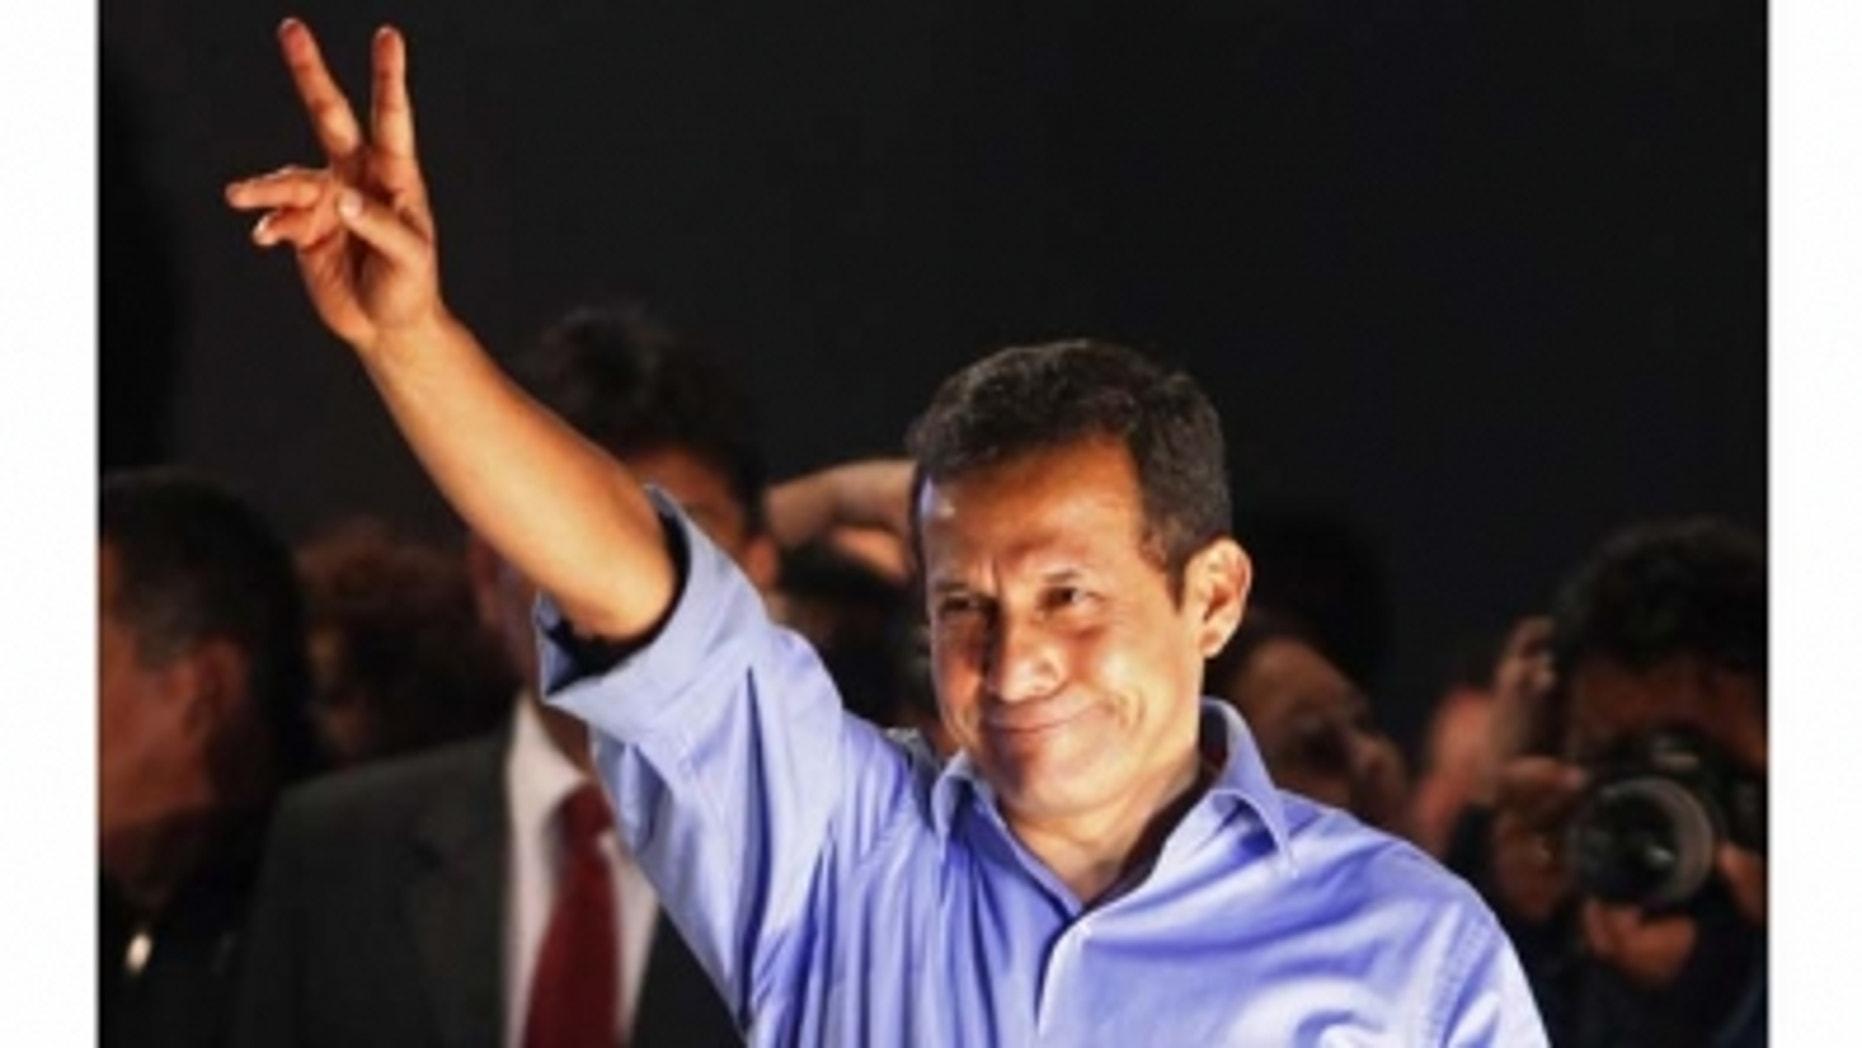 Ollanta Humala is Peru's President-elect.